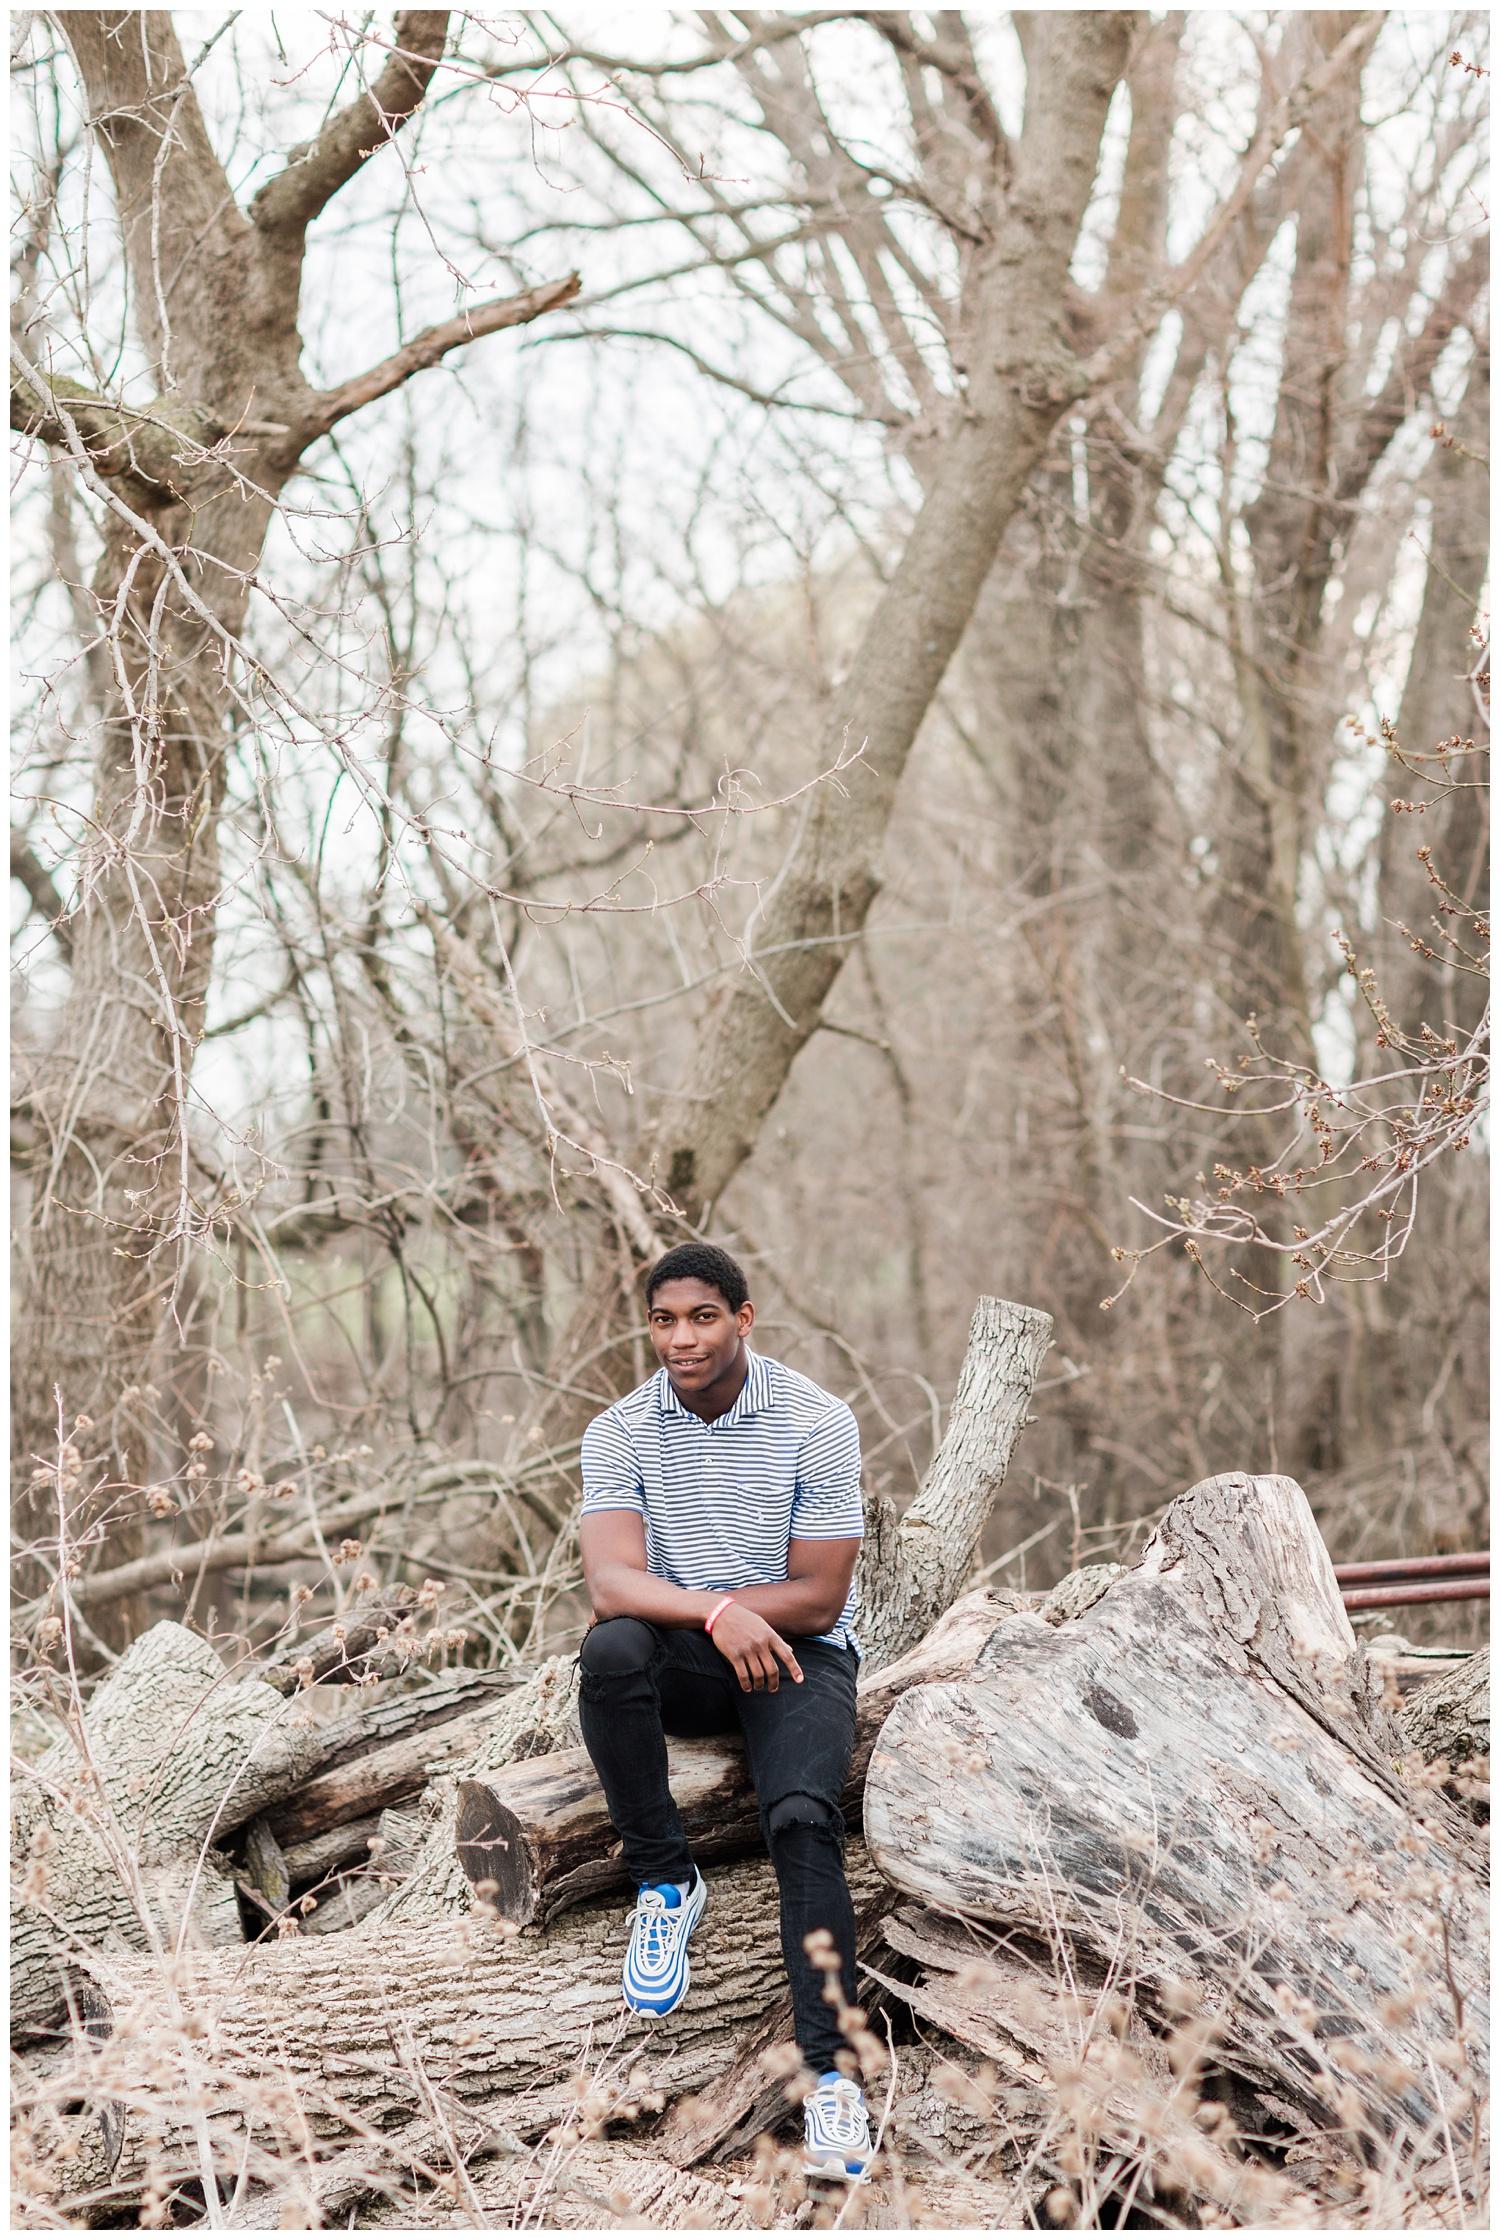 Algona high school senior posing on a pile of logs